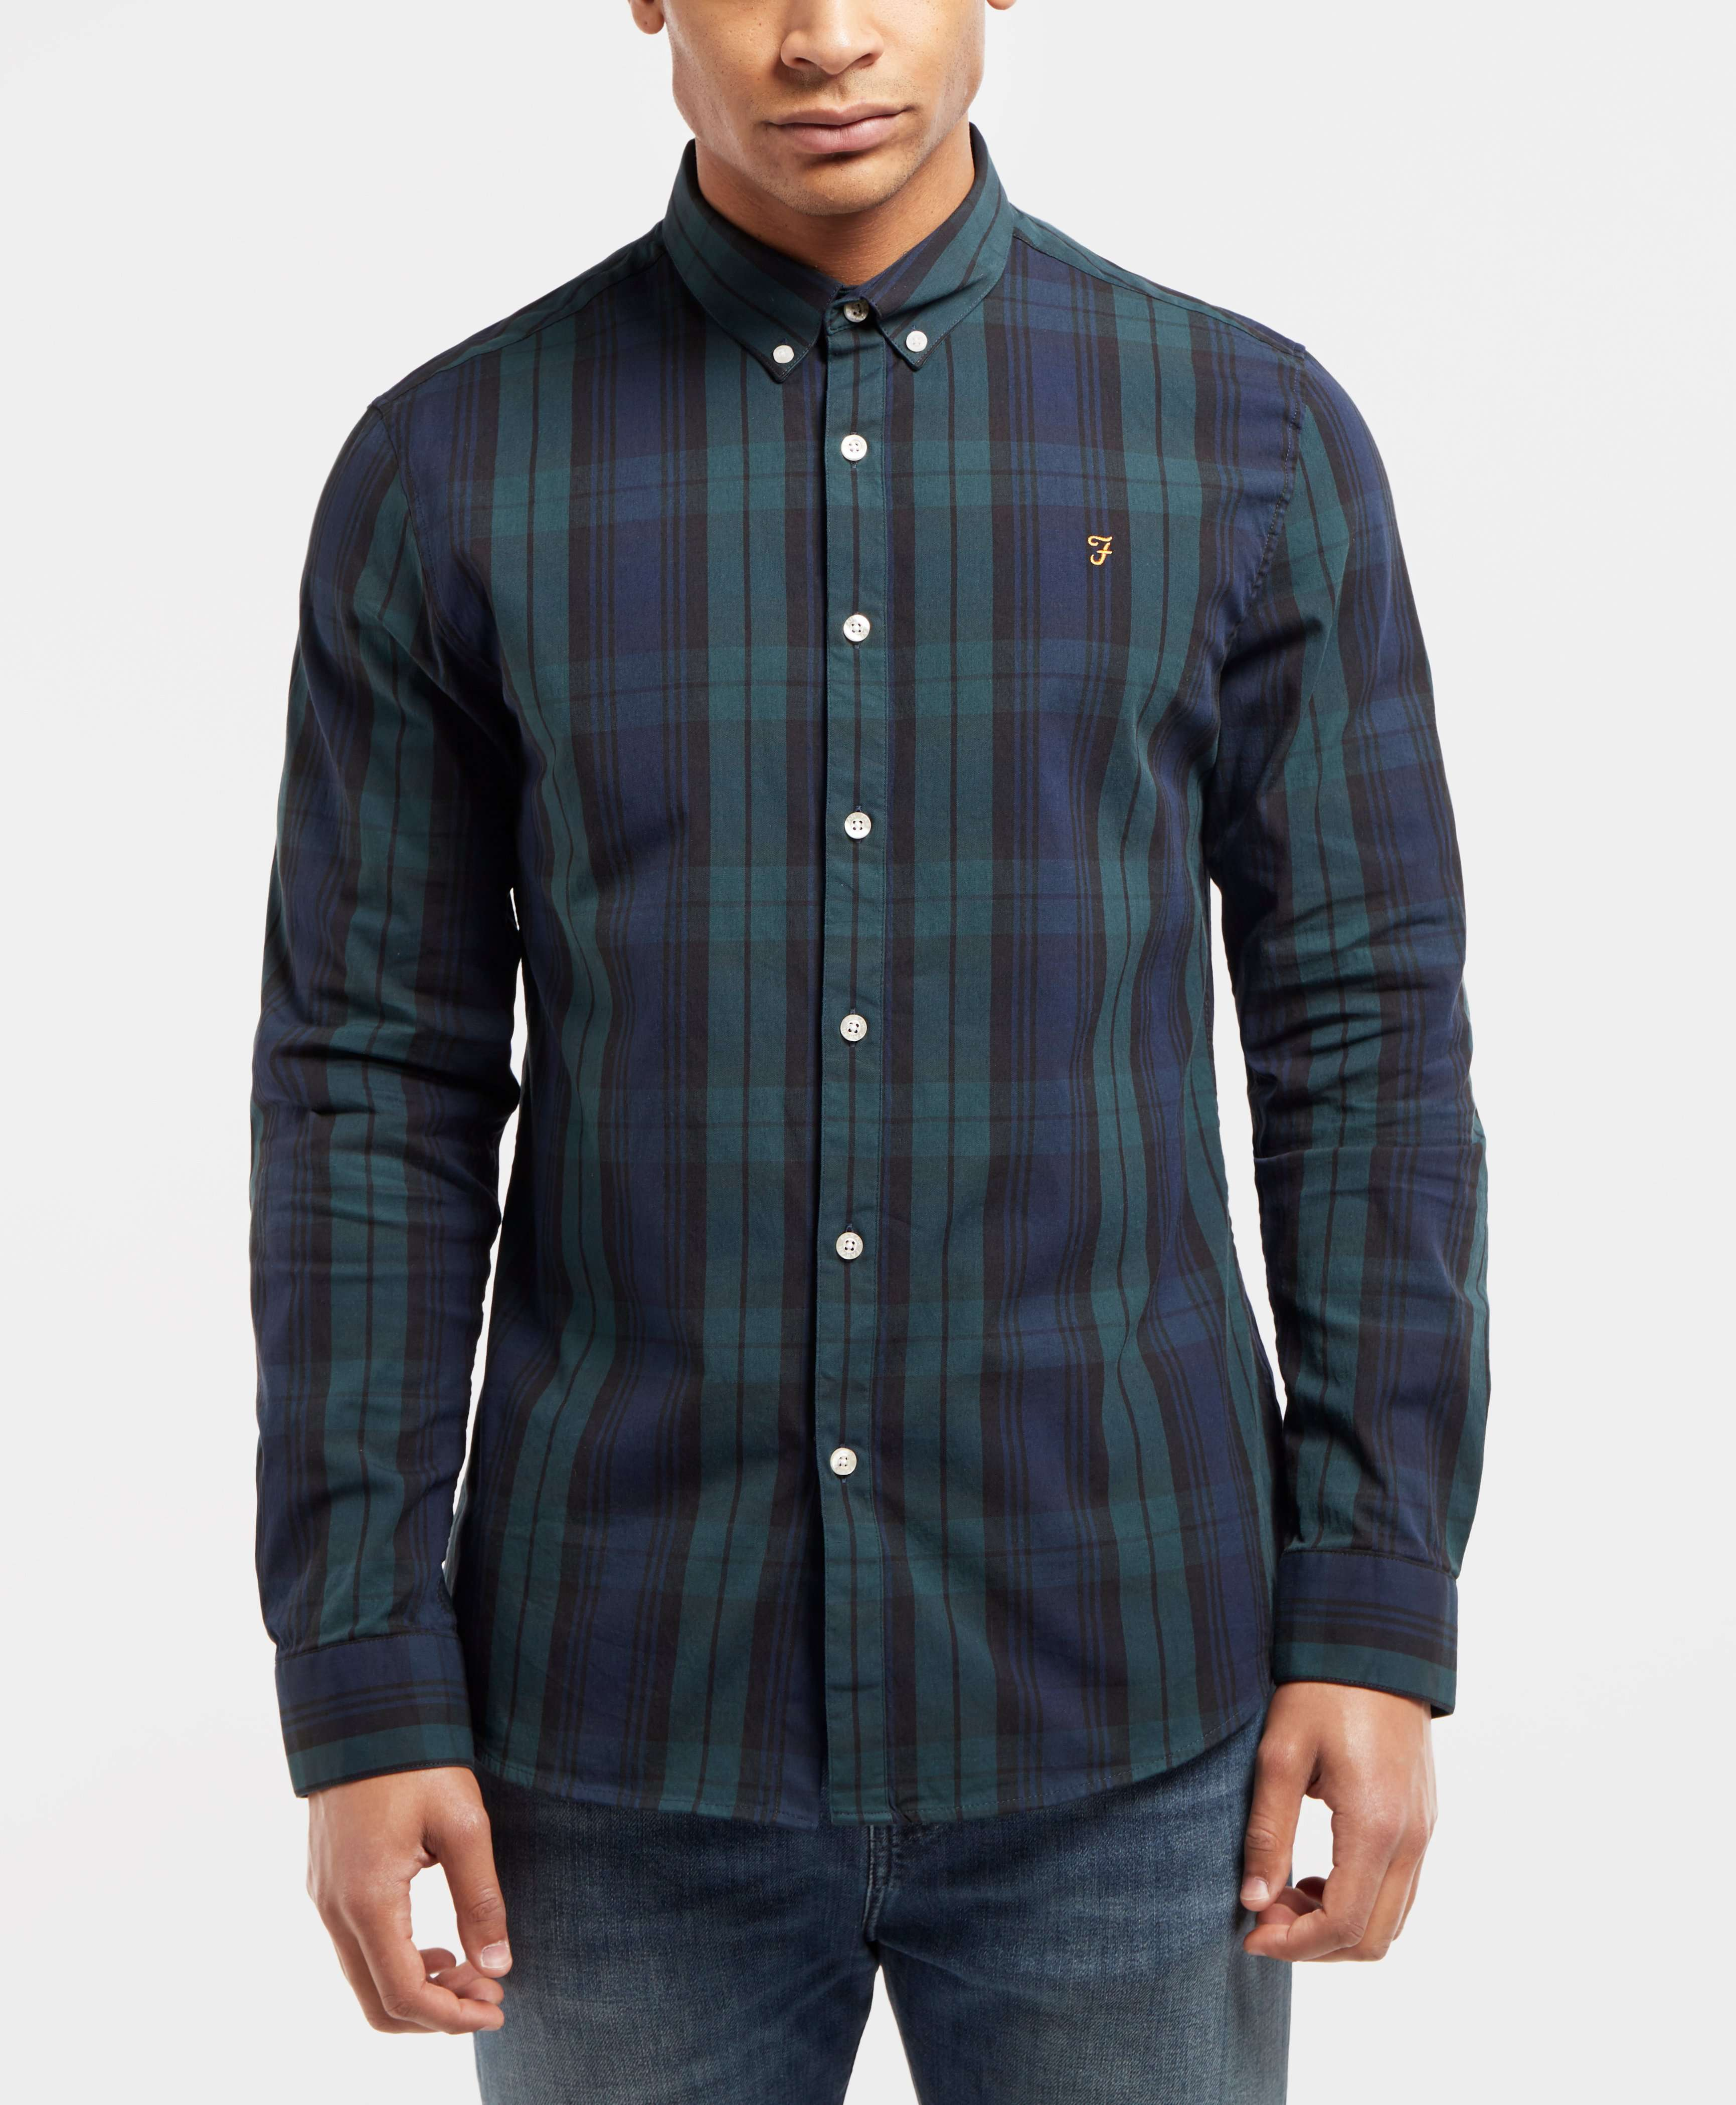 Farah Blackwatch Long Sleeve Check Shirt - Exclusive